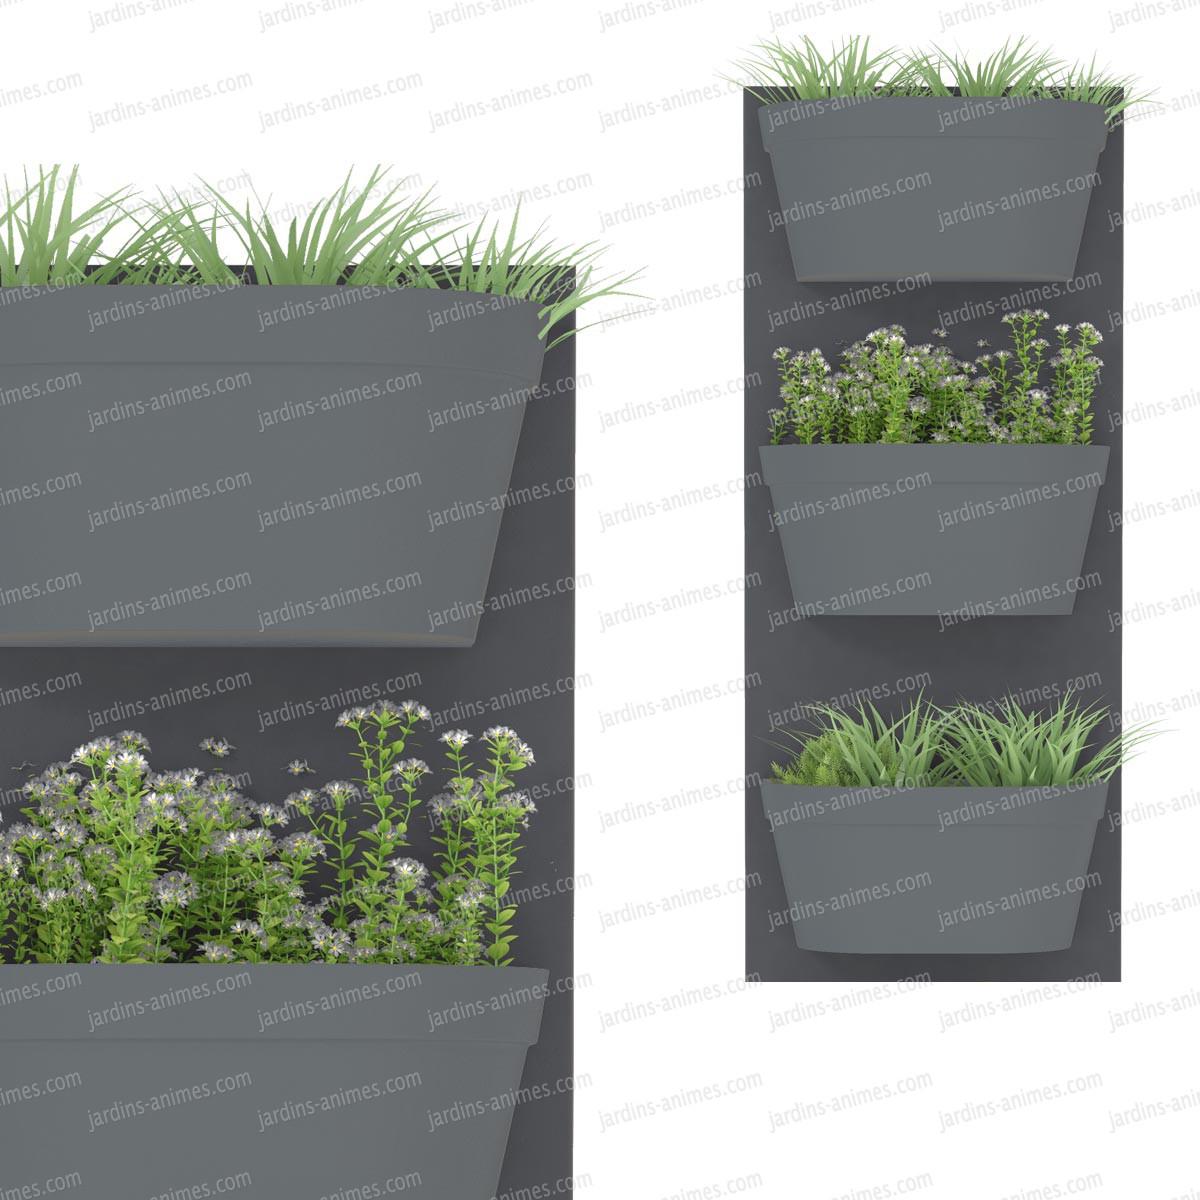 jardin vertical 3 bacs fond gris fonc bac anthracite pots de fleurs jardini res. Black Bedroom Furniture Sets. Home Design Ideas